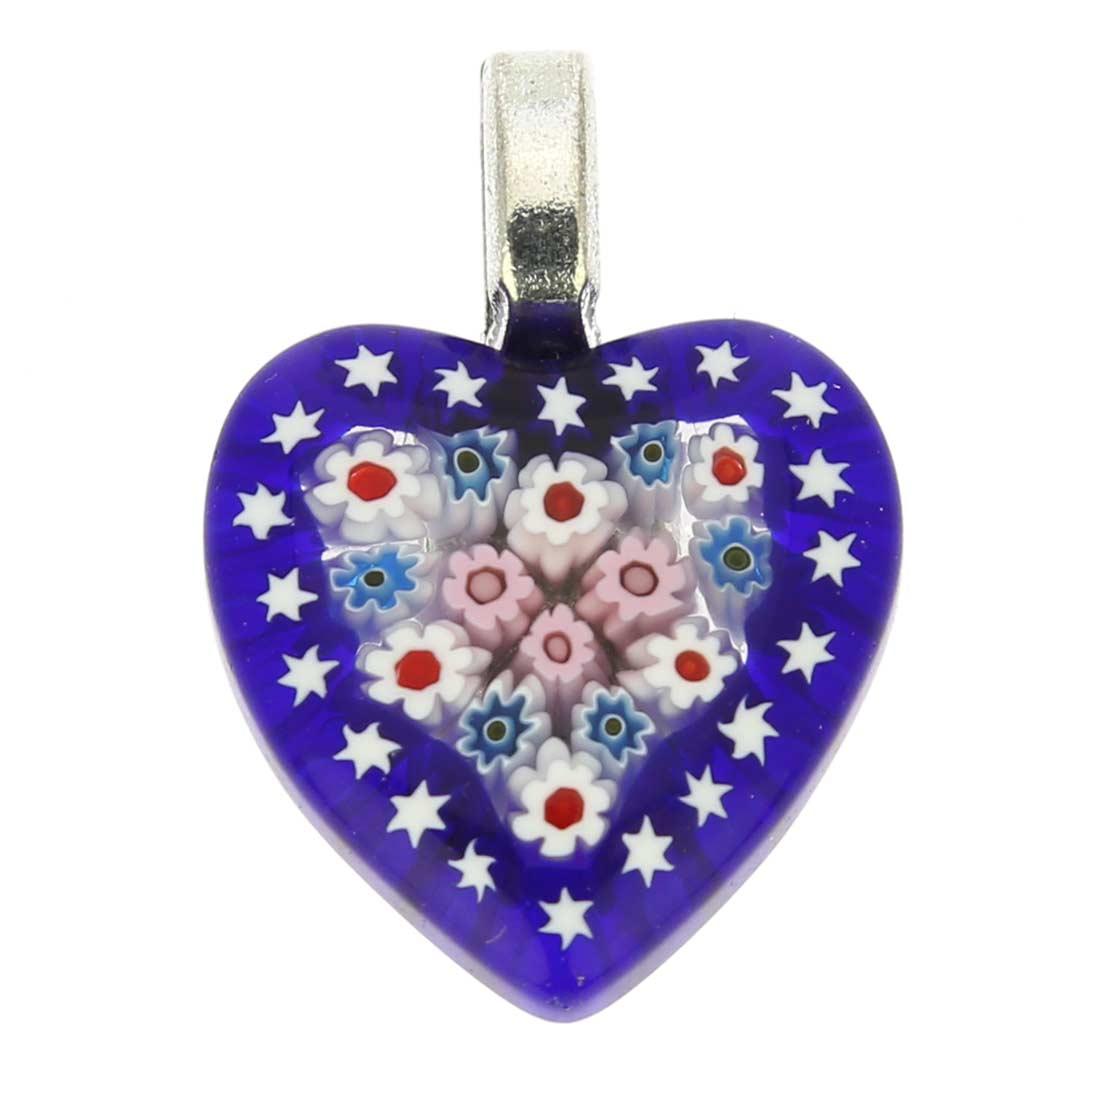 Millefiori Heart Pendant - Navy Blue